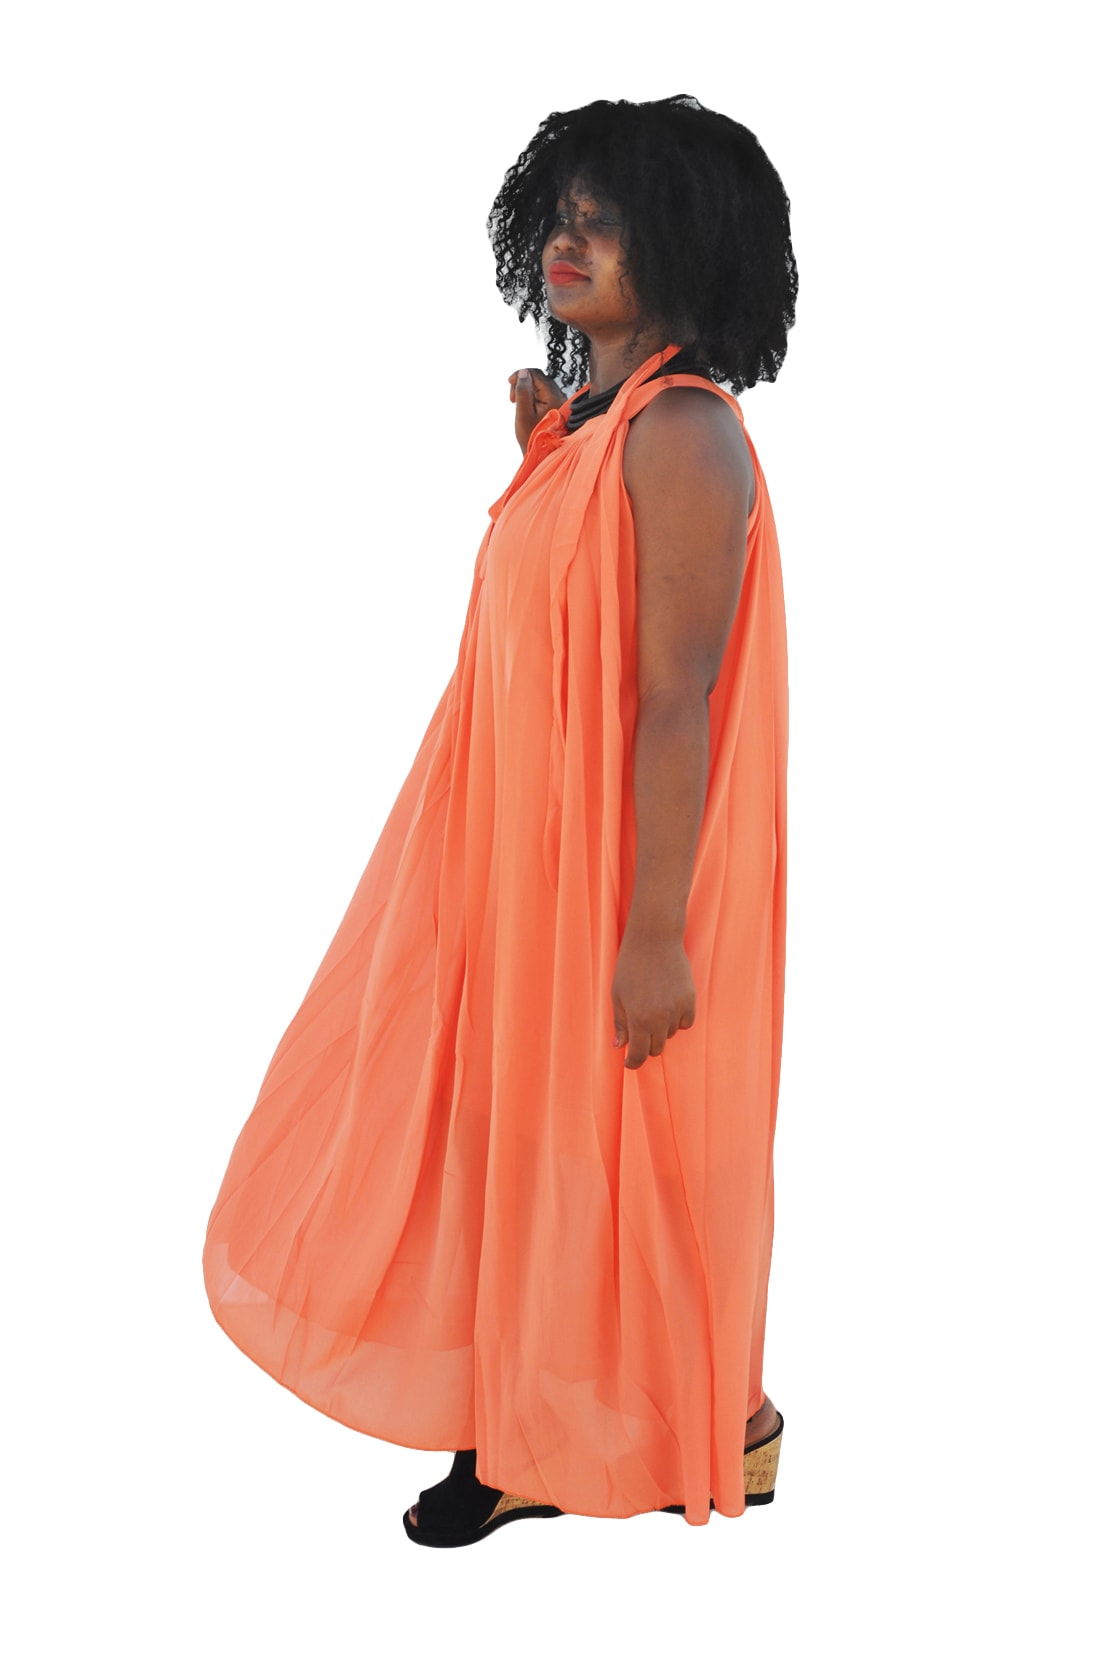 M0247 orange2 Wedding Bridesmaid Dresses maureens.com boutique